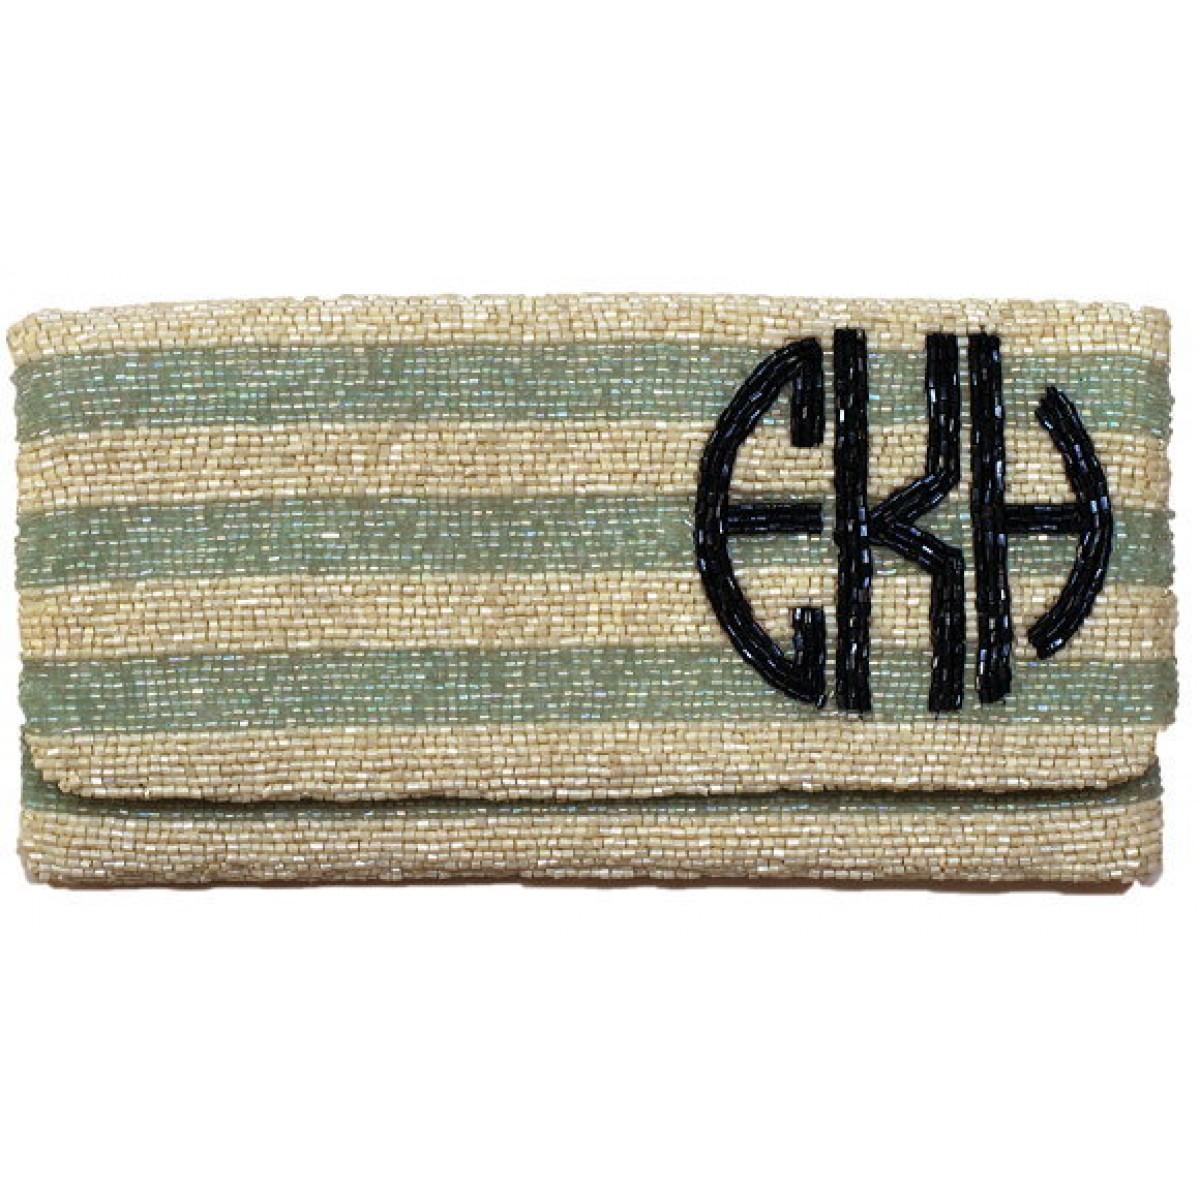 Horizontal Stripe Monogram Clutch